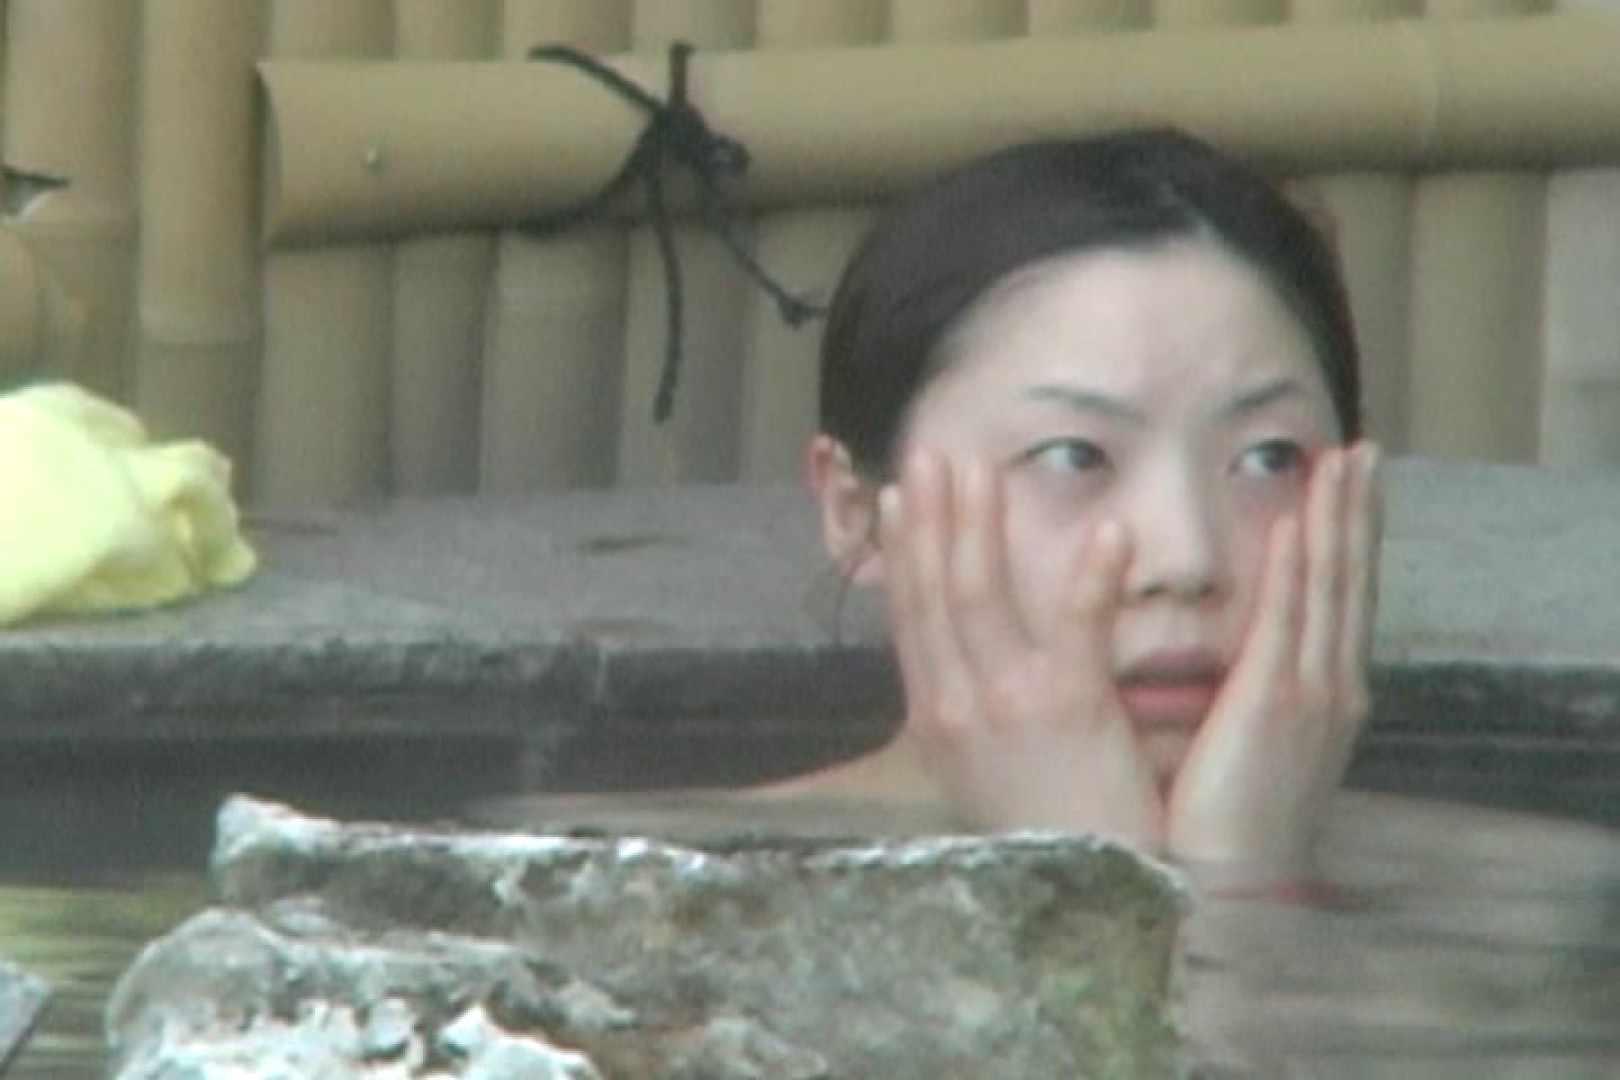 Aquaな露天風呂Vol.596 OLセックス | 盗撮  77画像 13